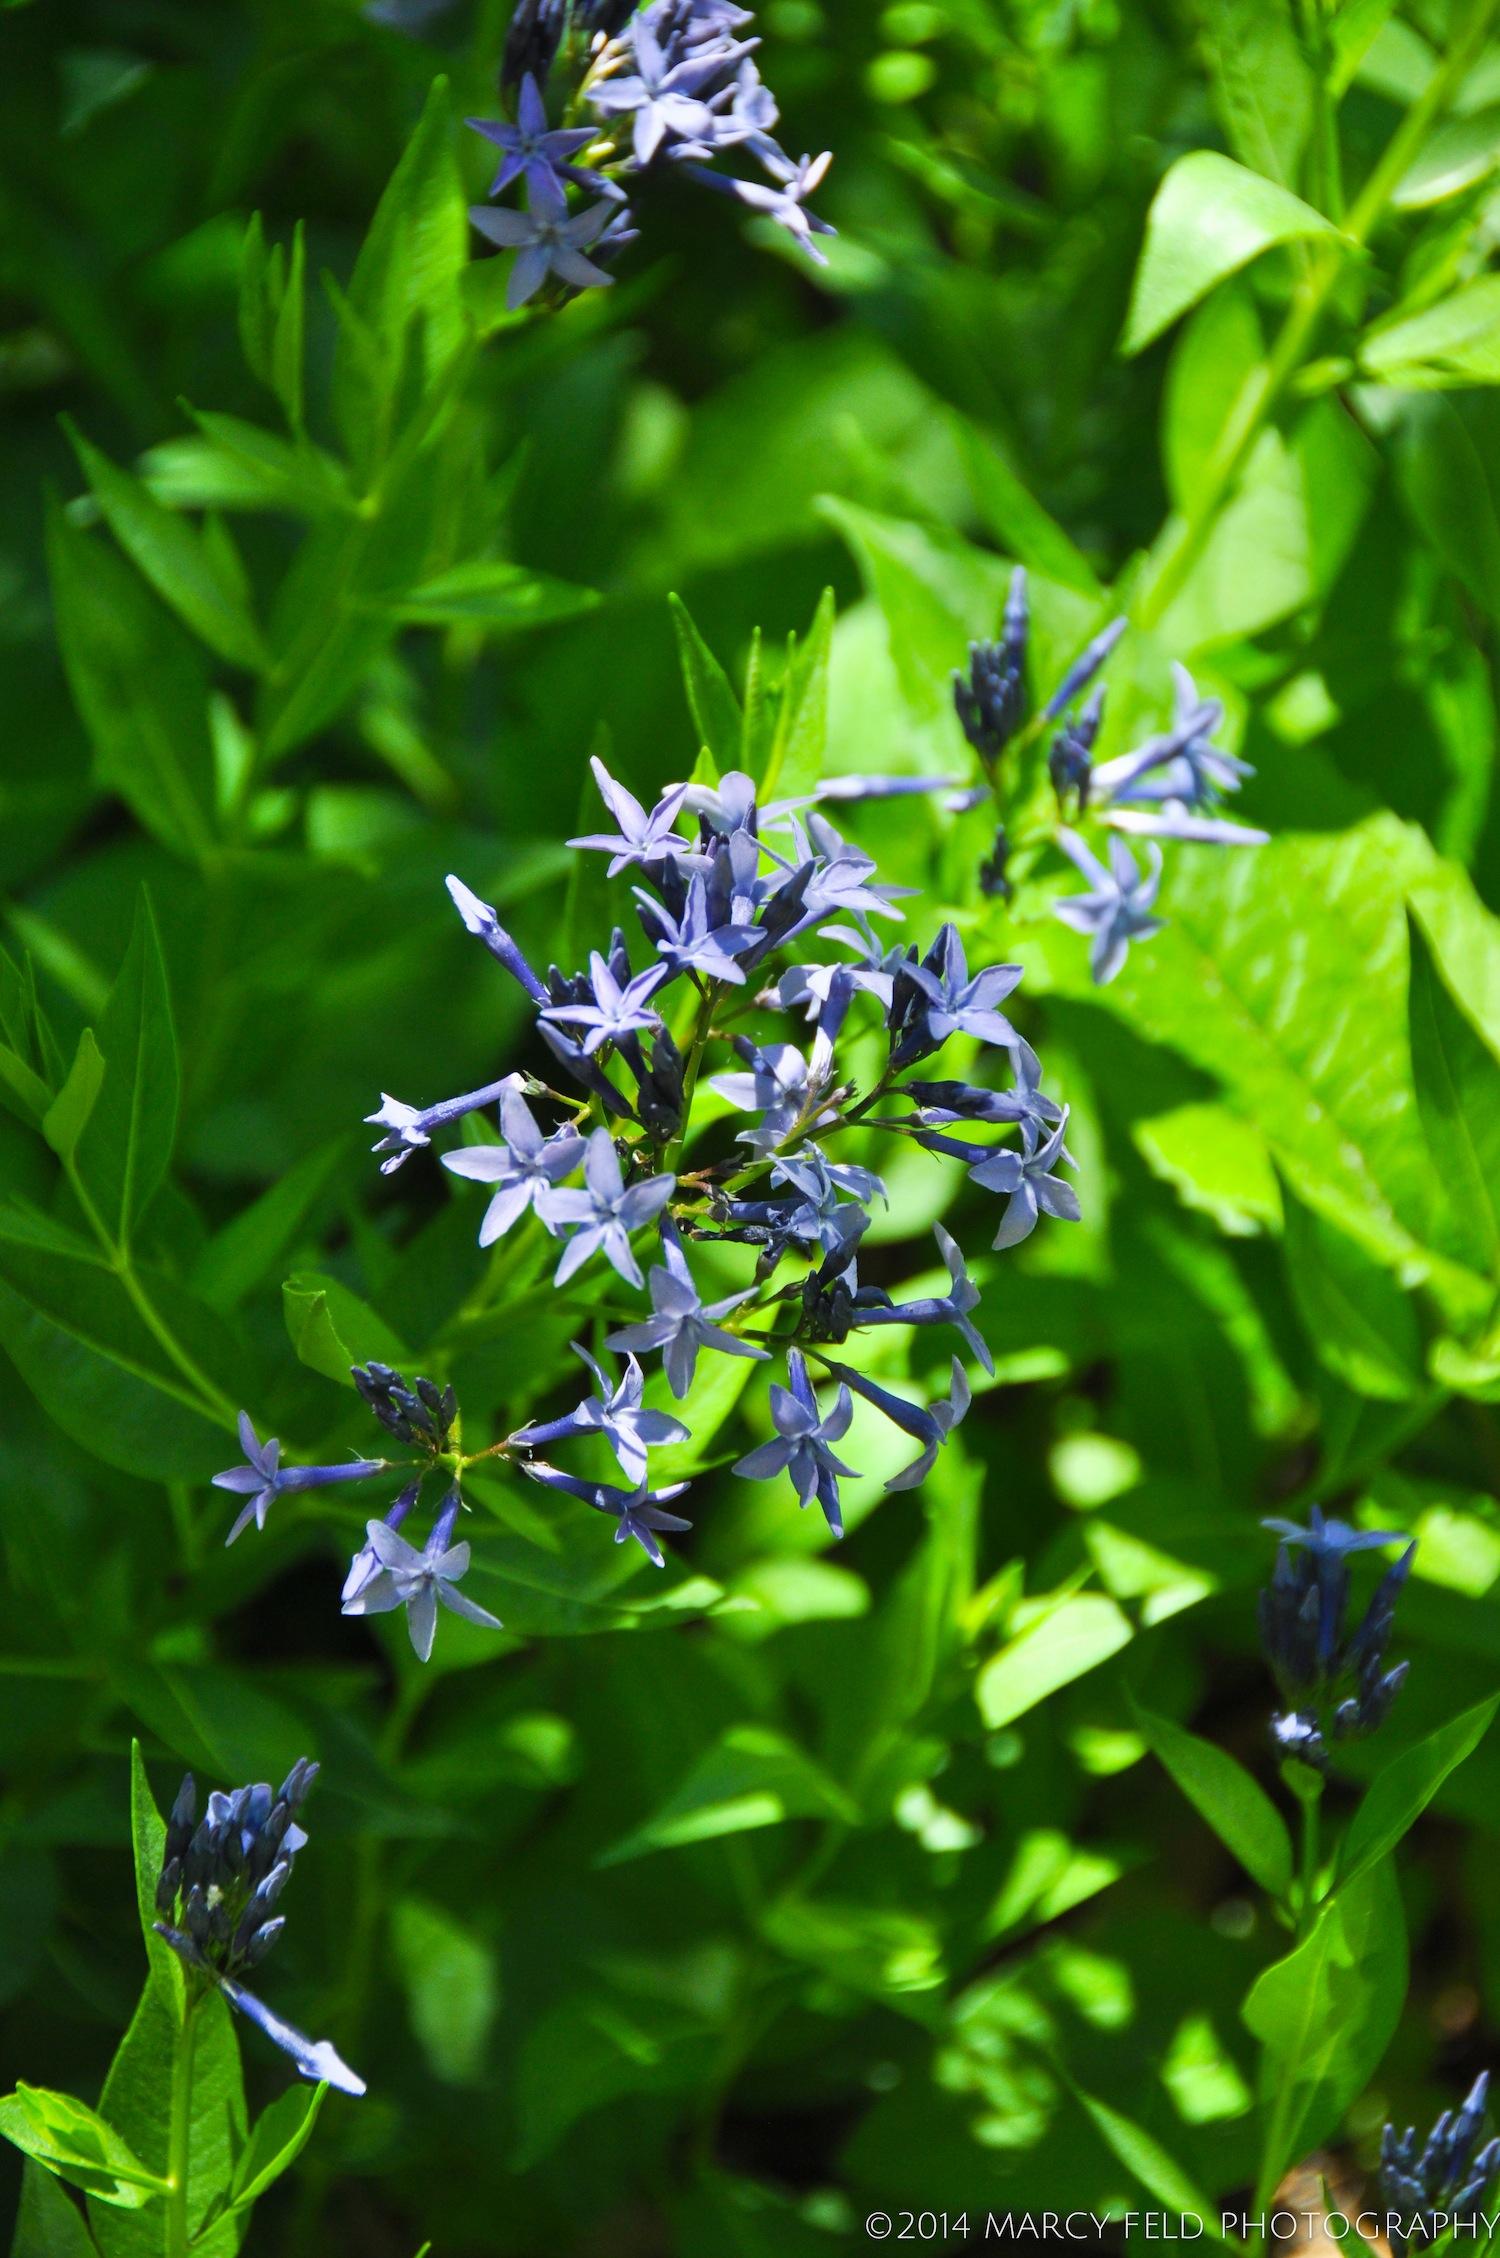 Blue Star 'Amsonia'